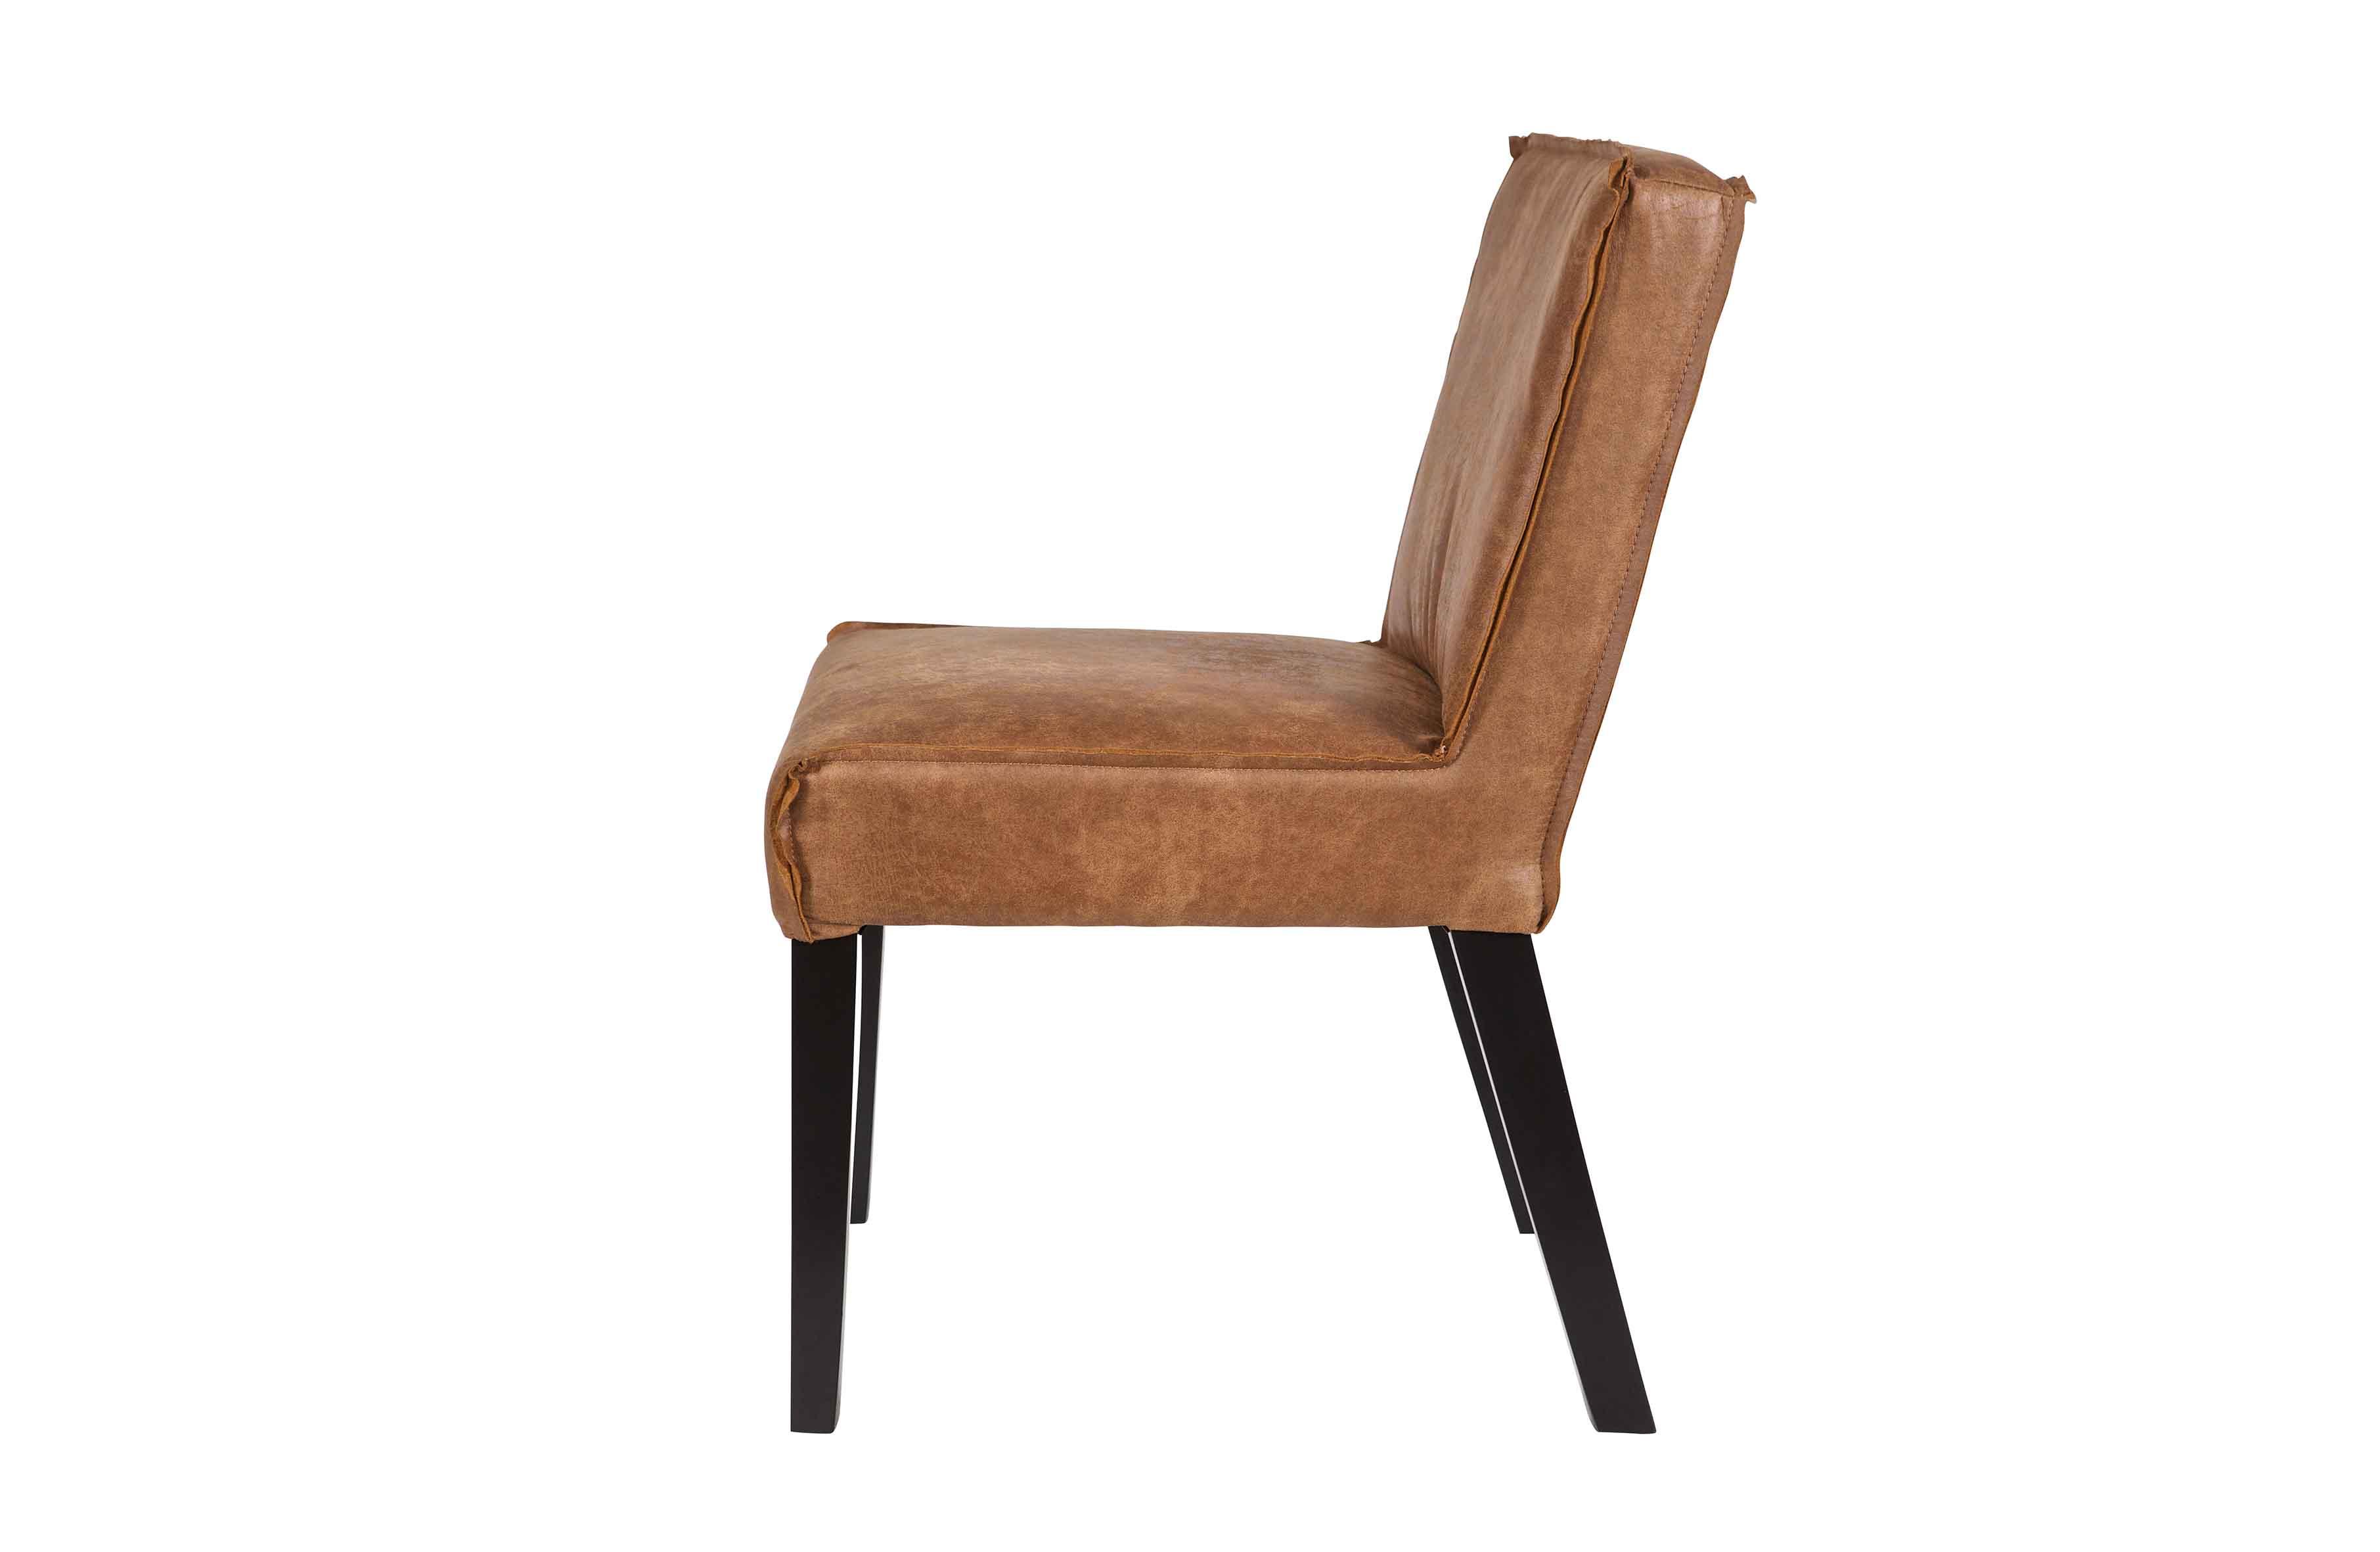 Rodeo eetkamerstoel meubilex for Eetkamer stoel